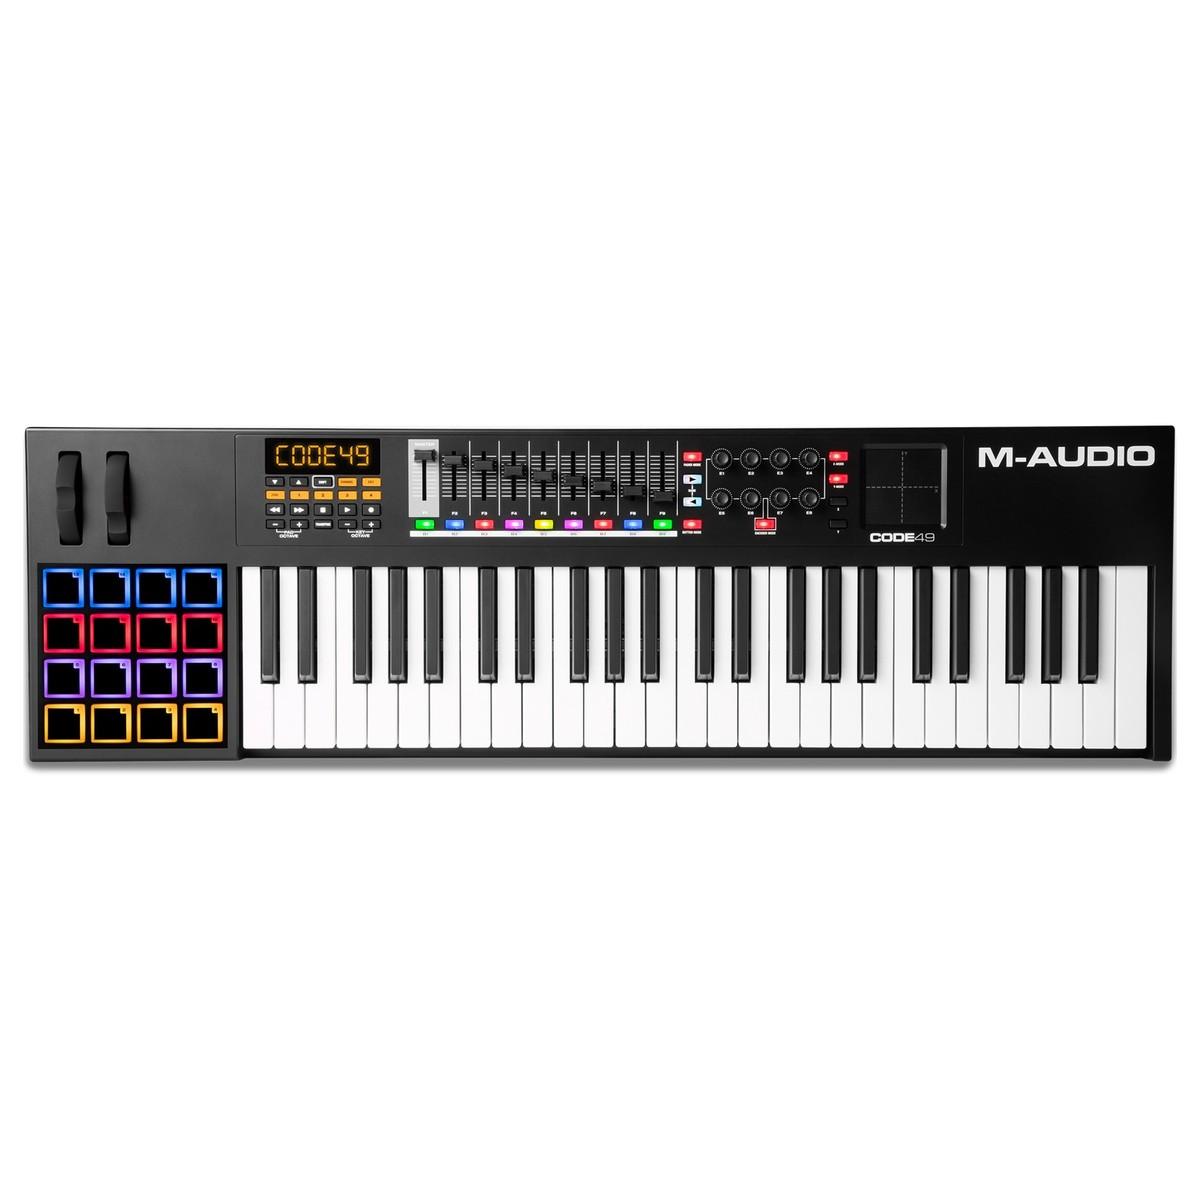 Cheap M-Audio Code 49 Black